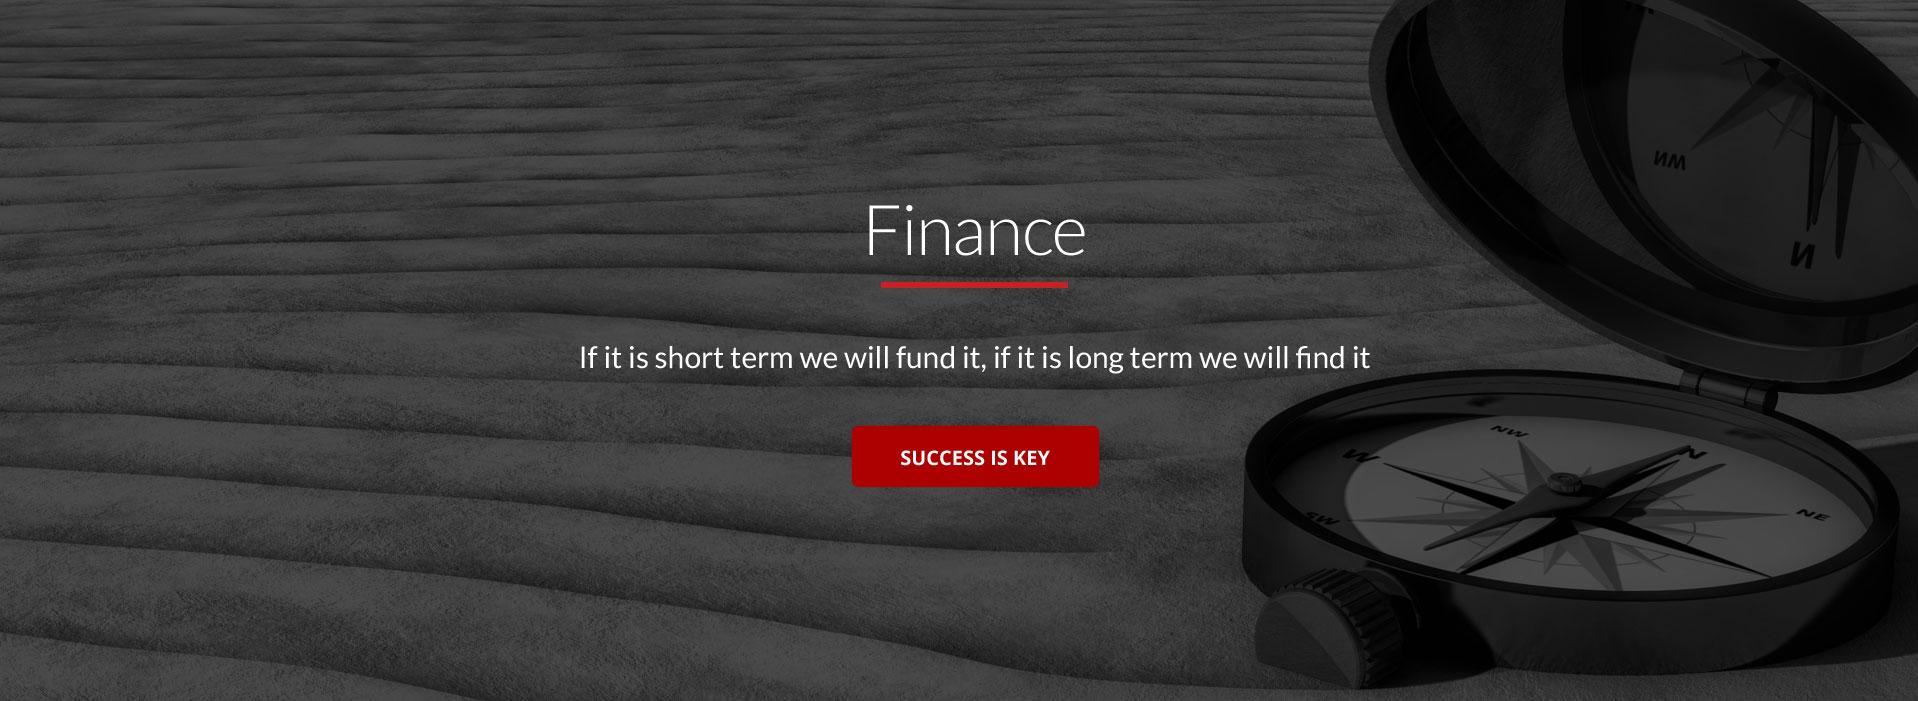 03-finance